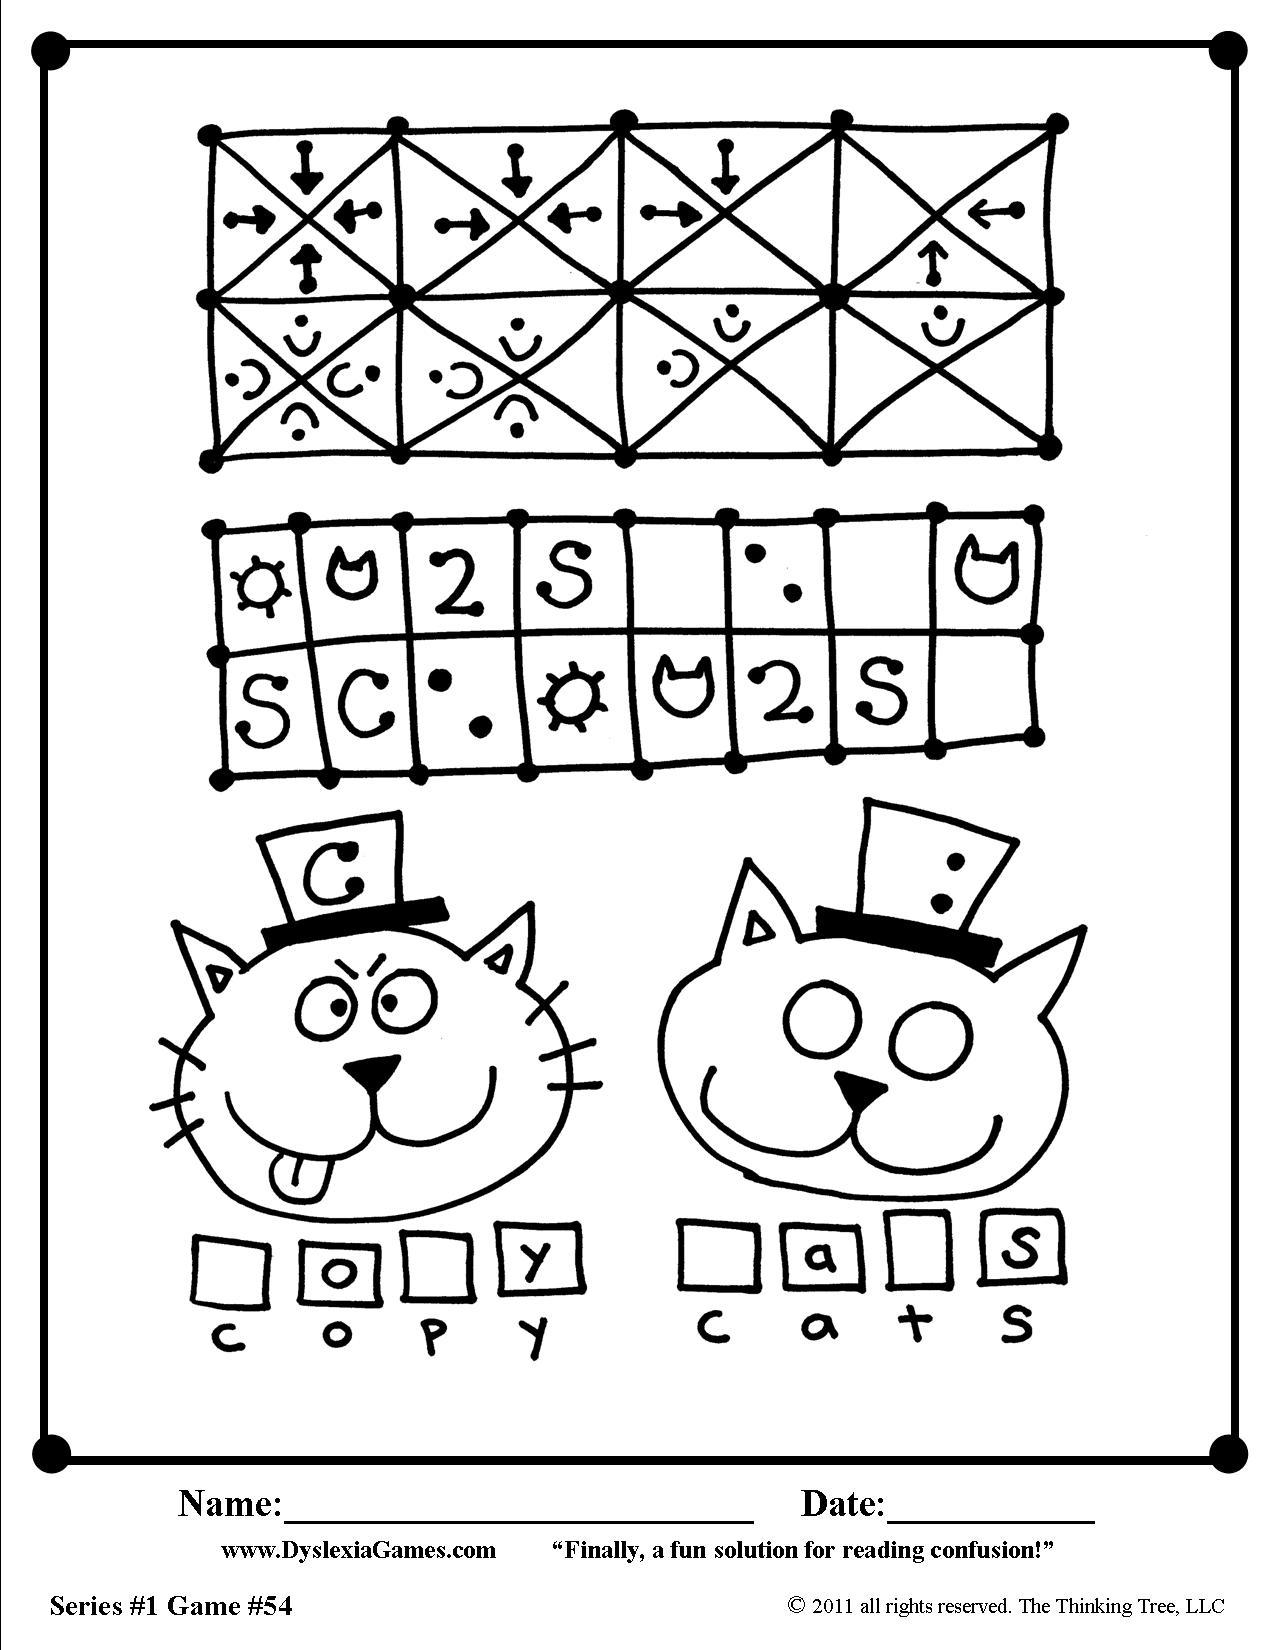 5 free dyslexia games worksheets for letter reversals d b p q. Black Bedroom Furniture Sets. Home Design Ideas